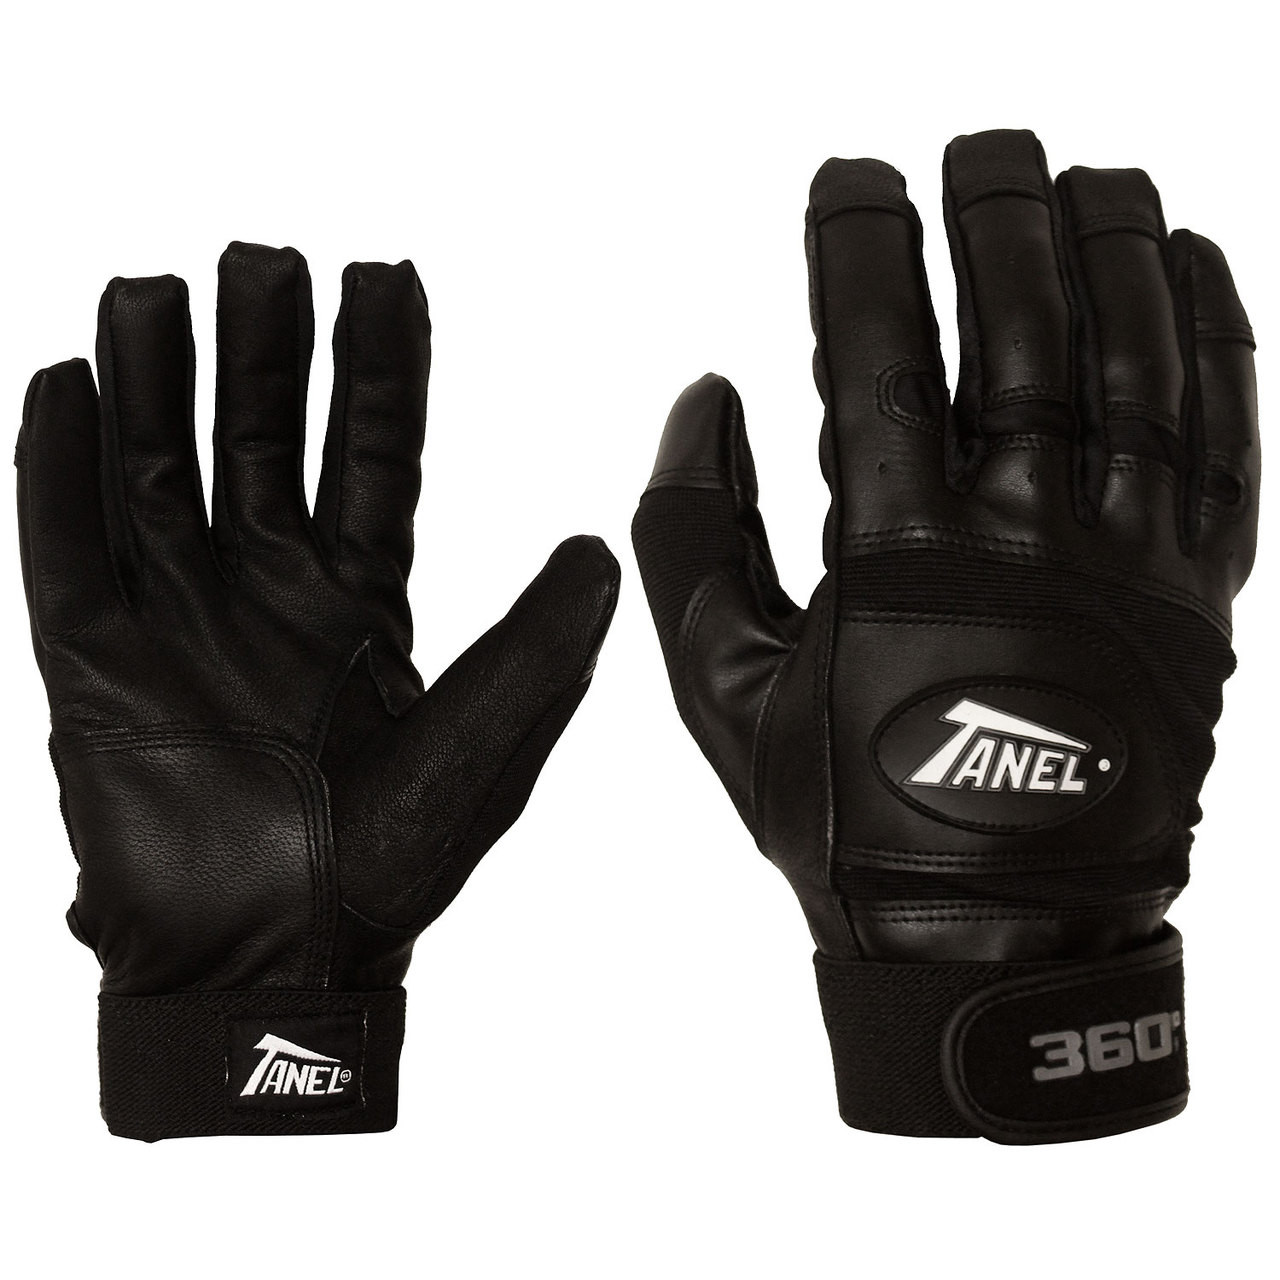 Black leather batting gloves - Smooth Grain Batting Gloves